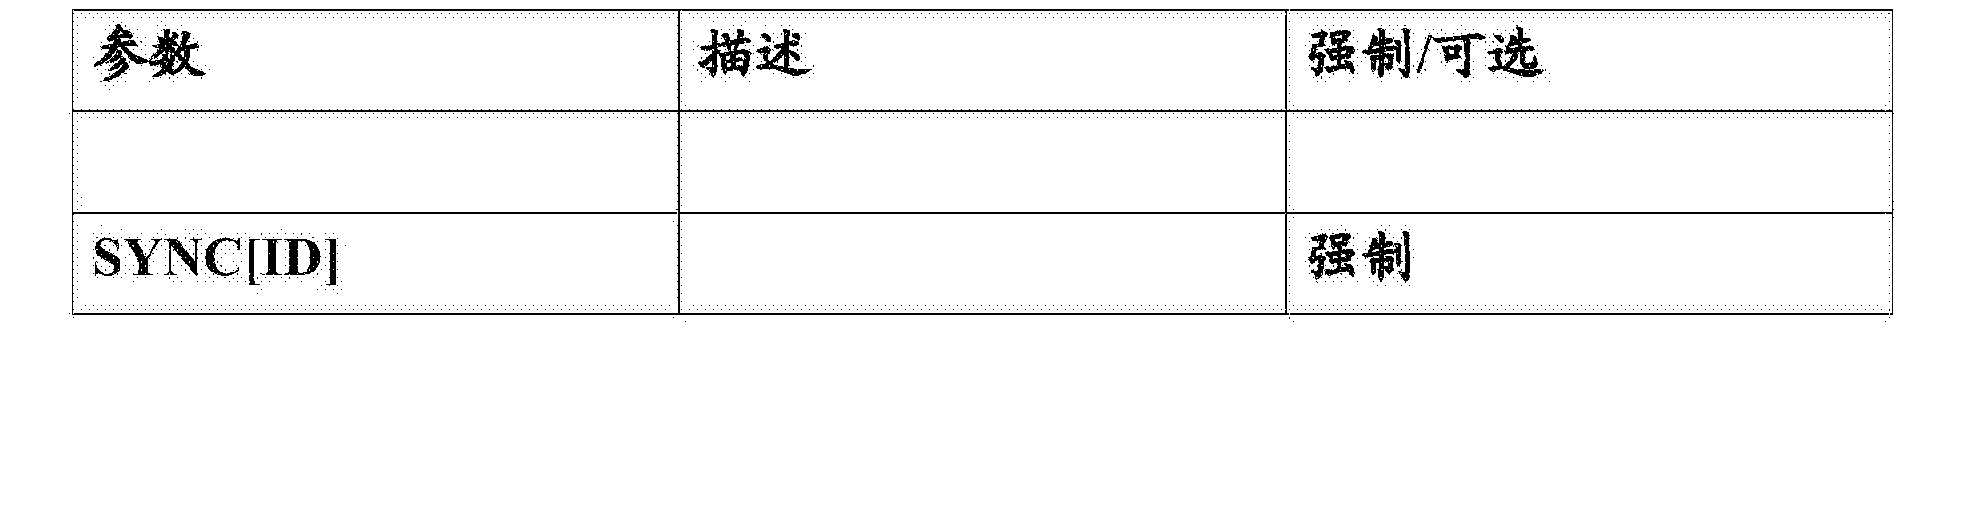 Figure CN107276552AD00211